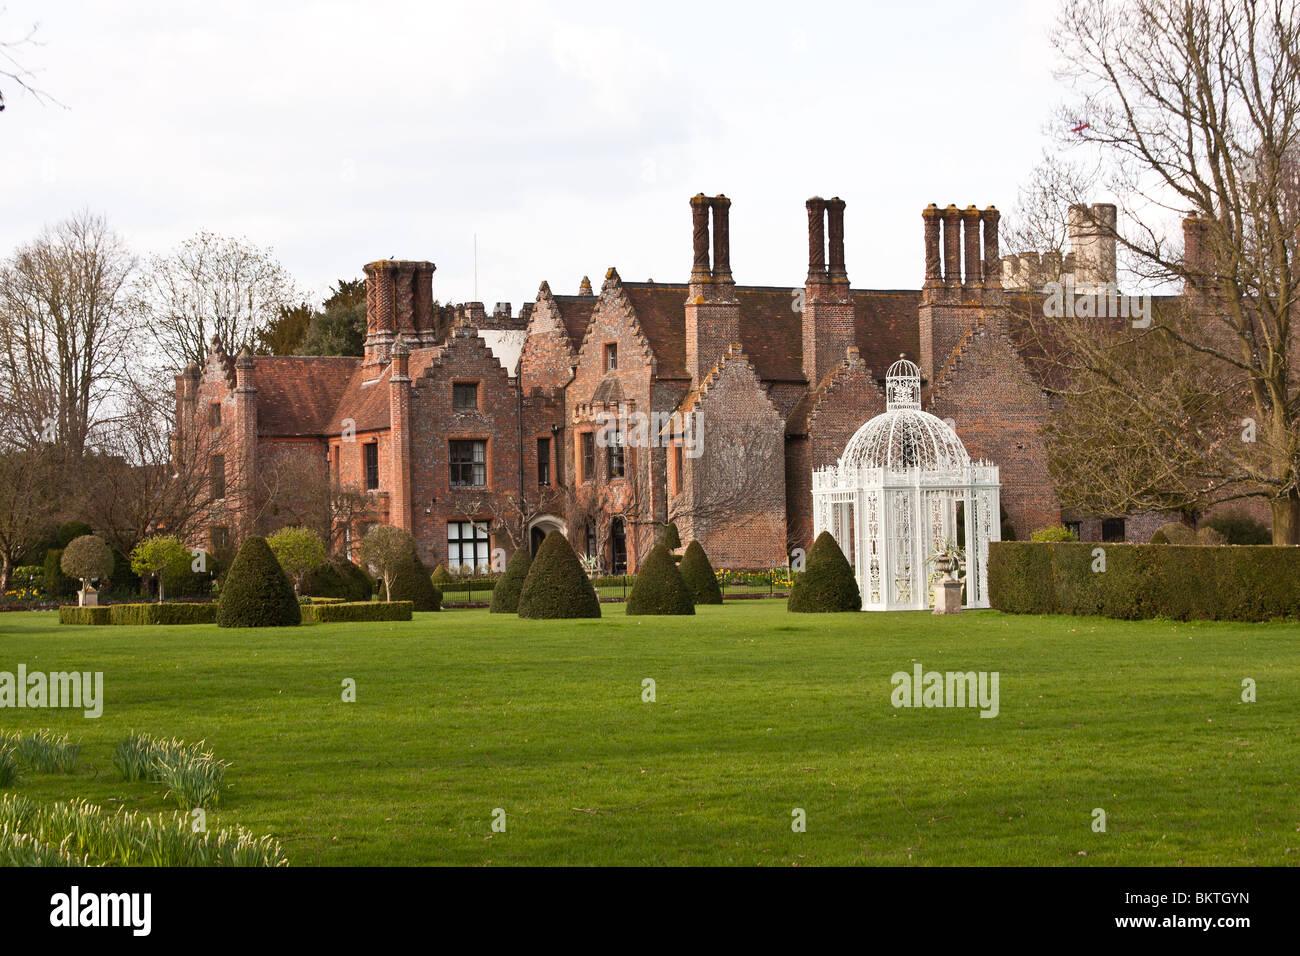 chenies manor, buckinghamshire, england stock photo, royalty free